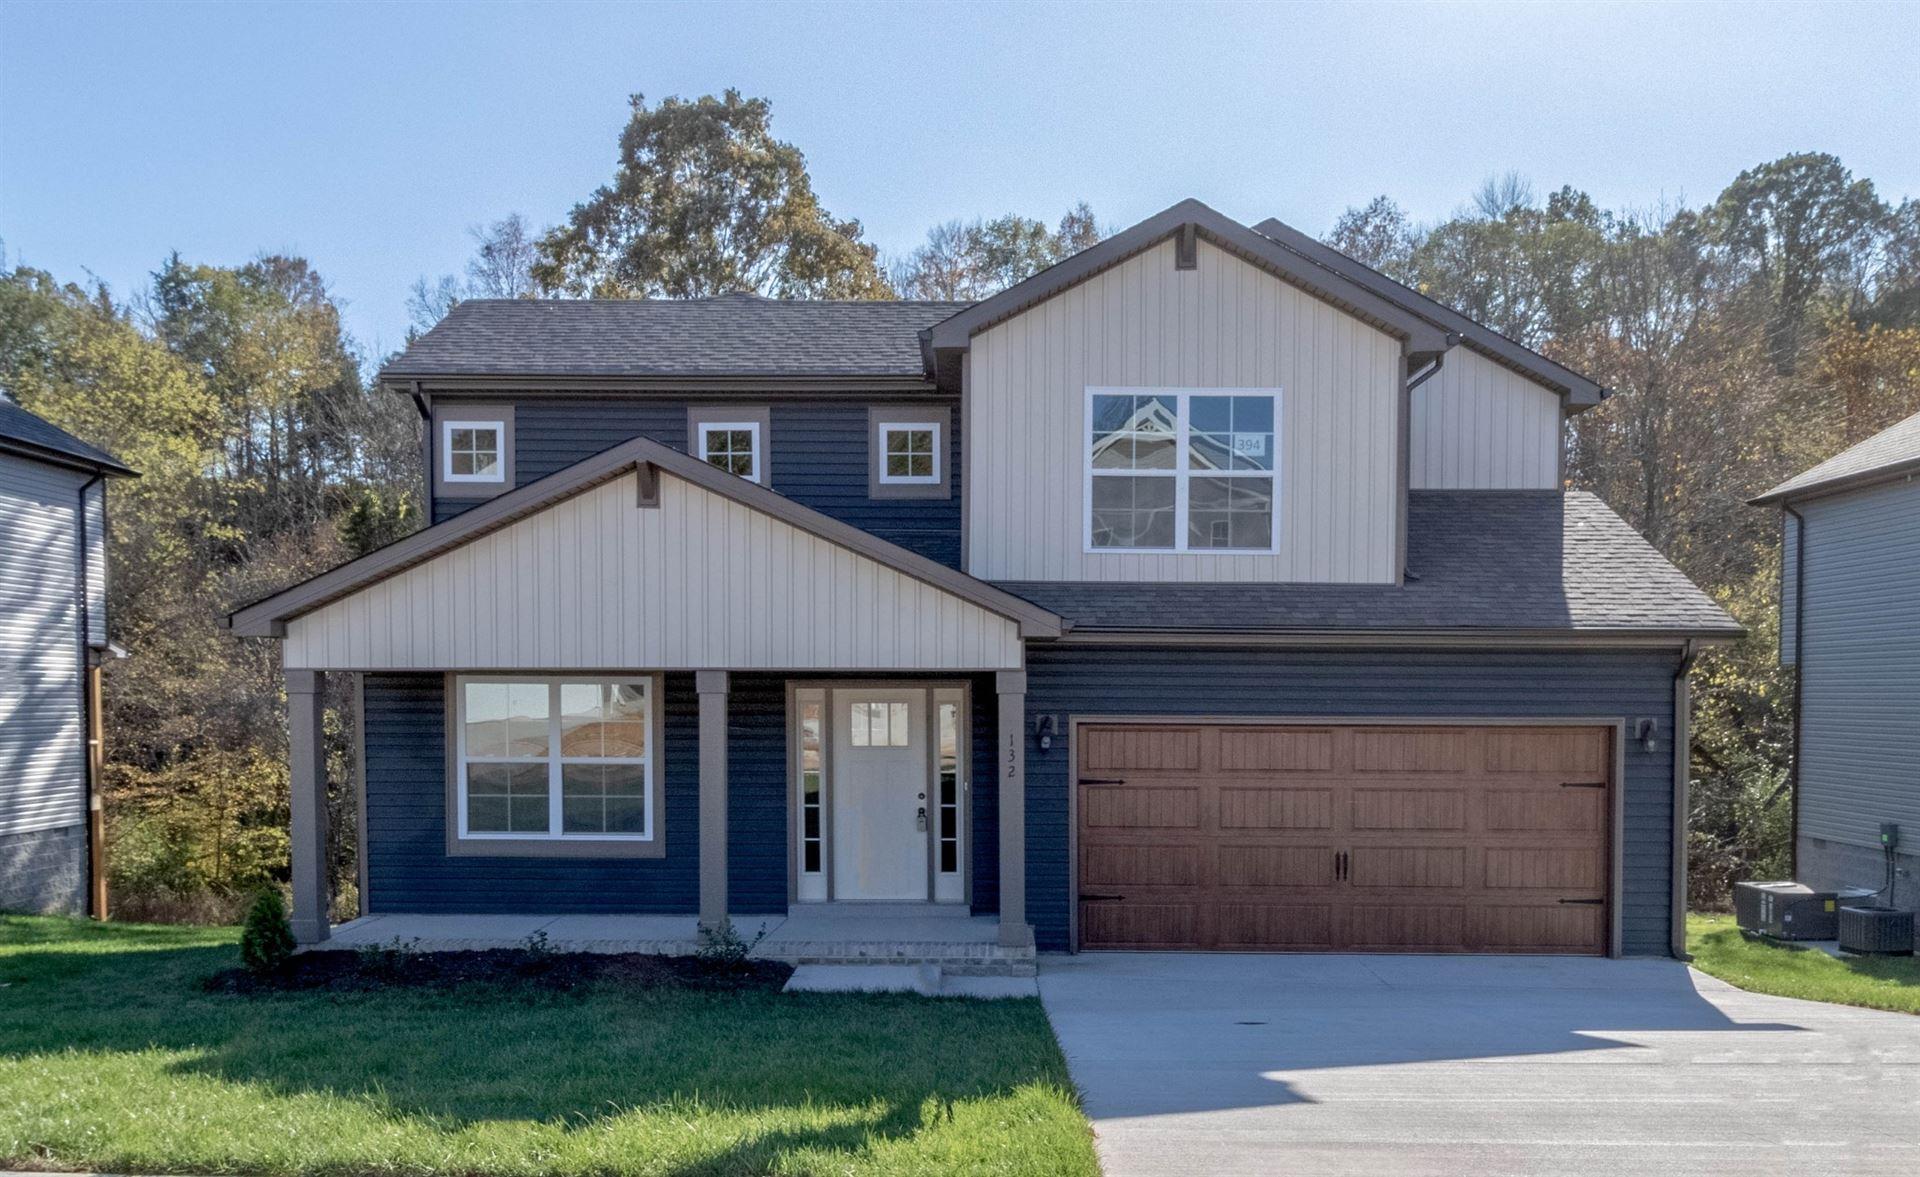 132 Bonnell Drive, Clarksville, TN 37042 - MLS#: 2164943